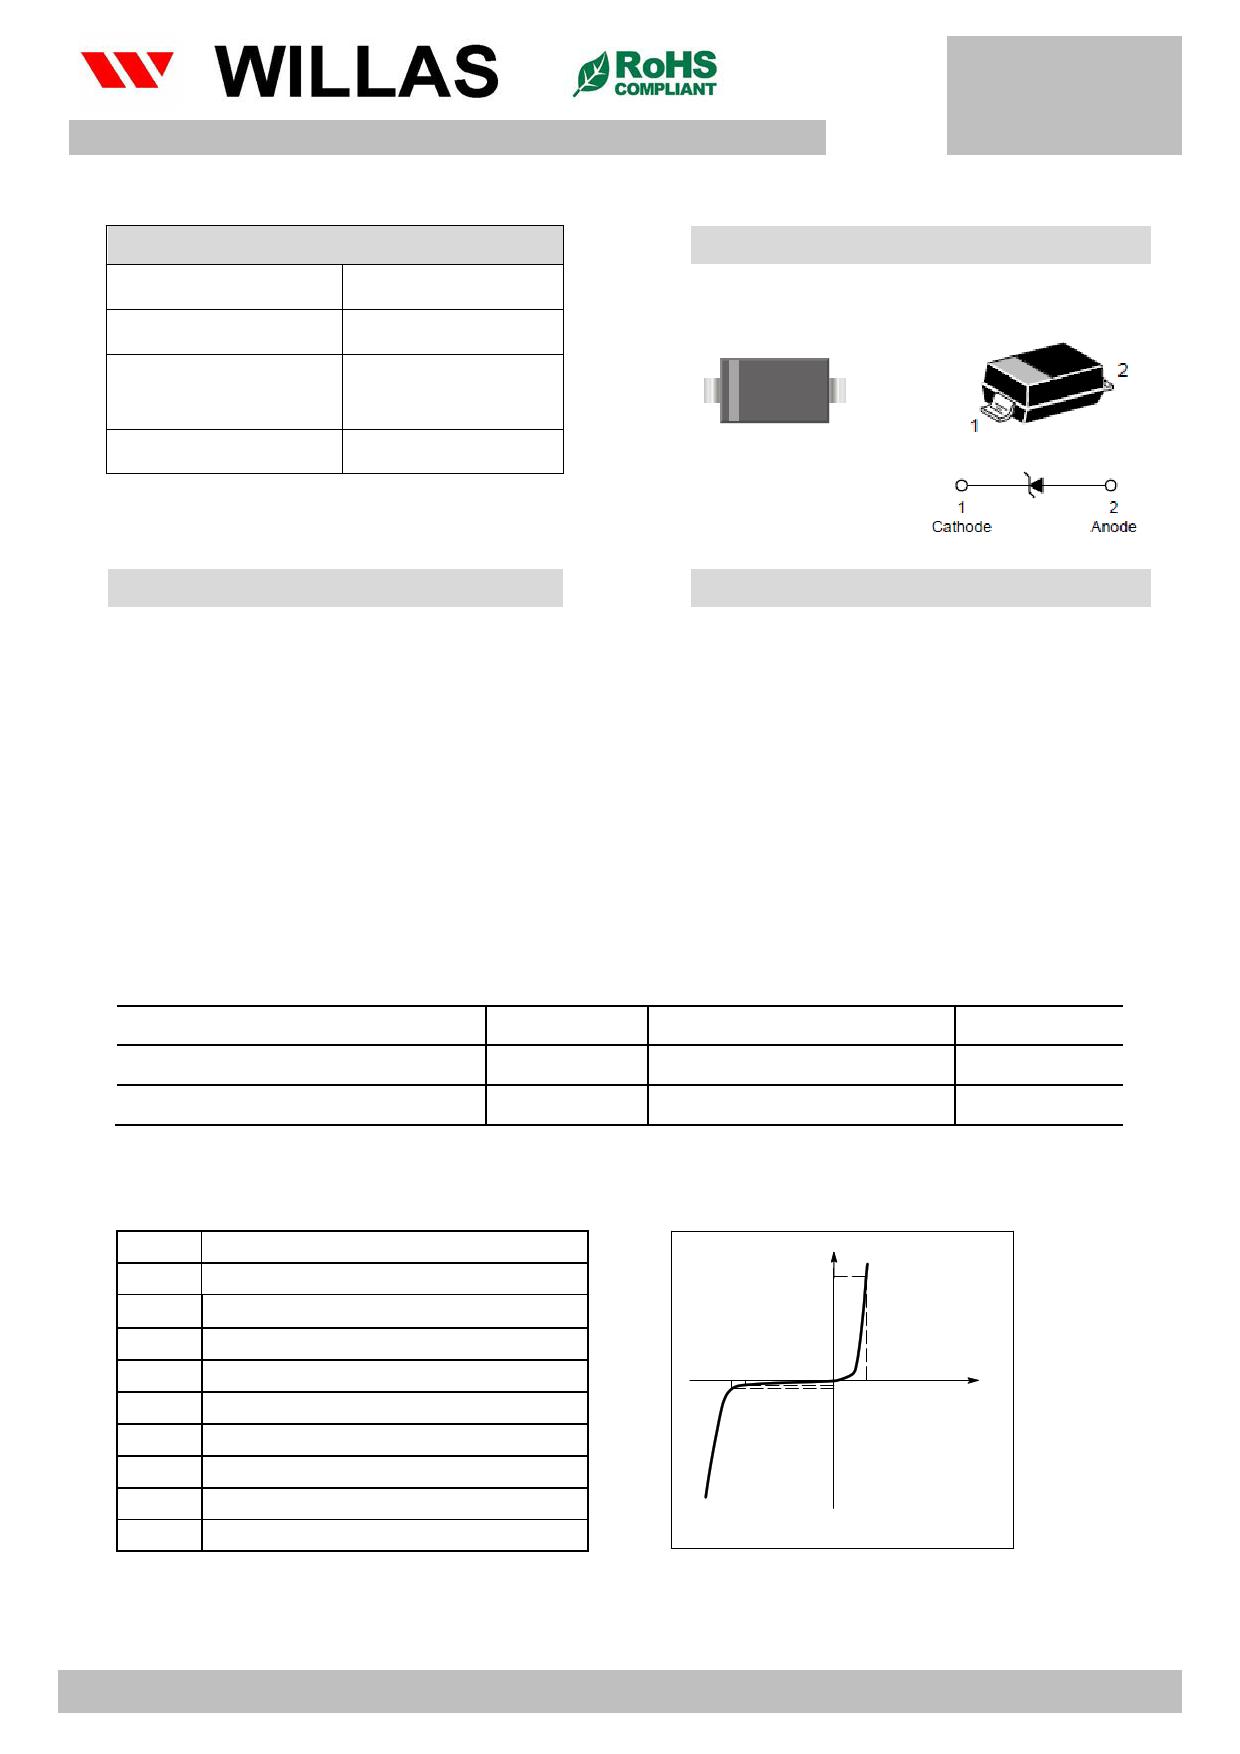 MMSZ5259B Datasheet